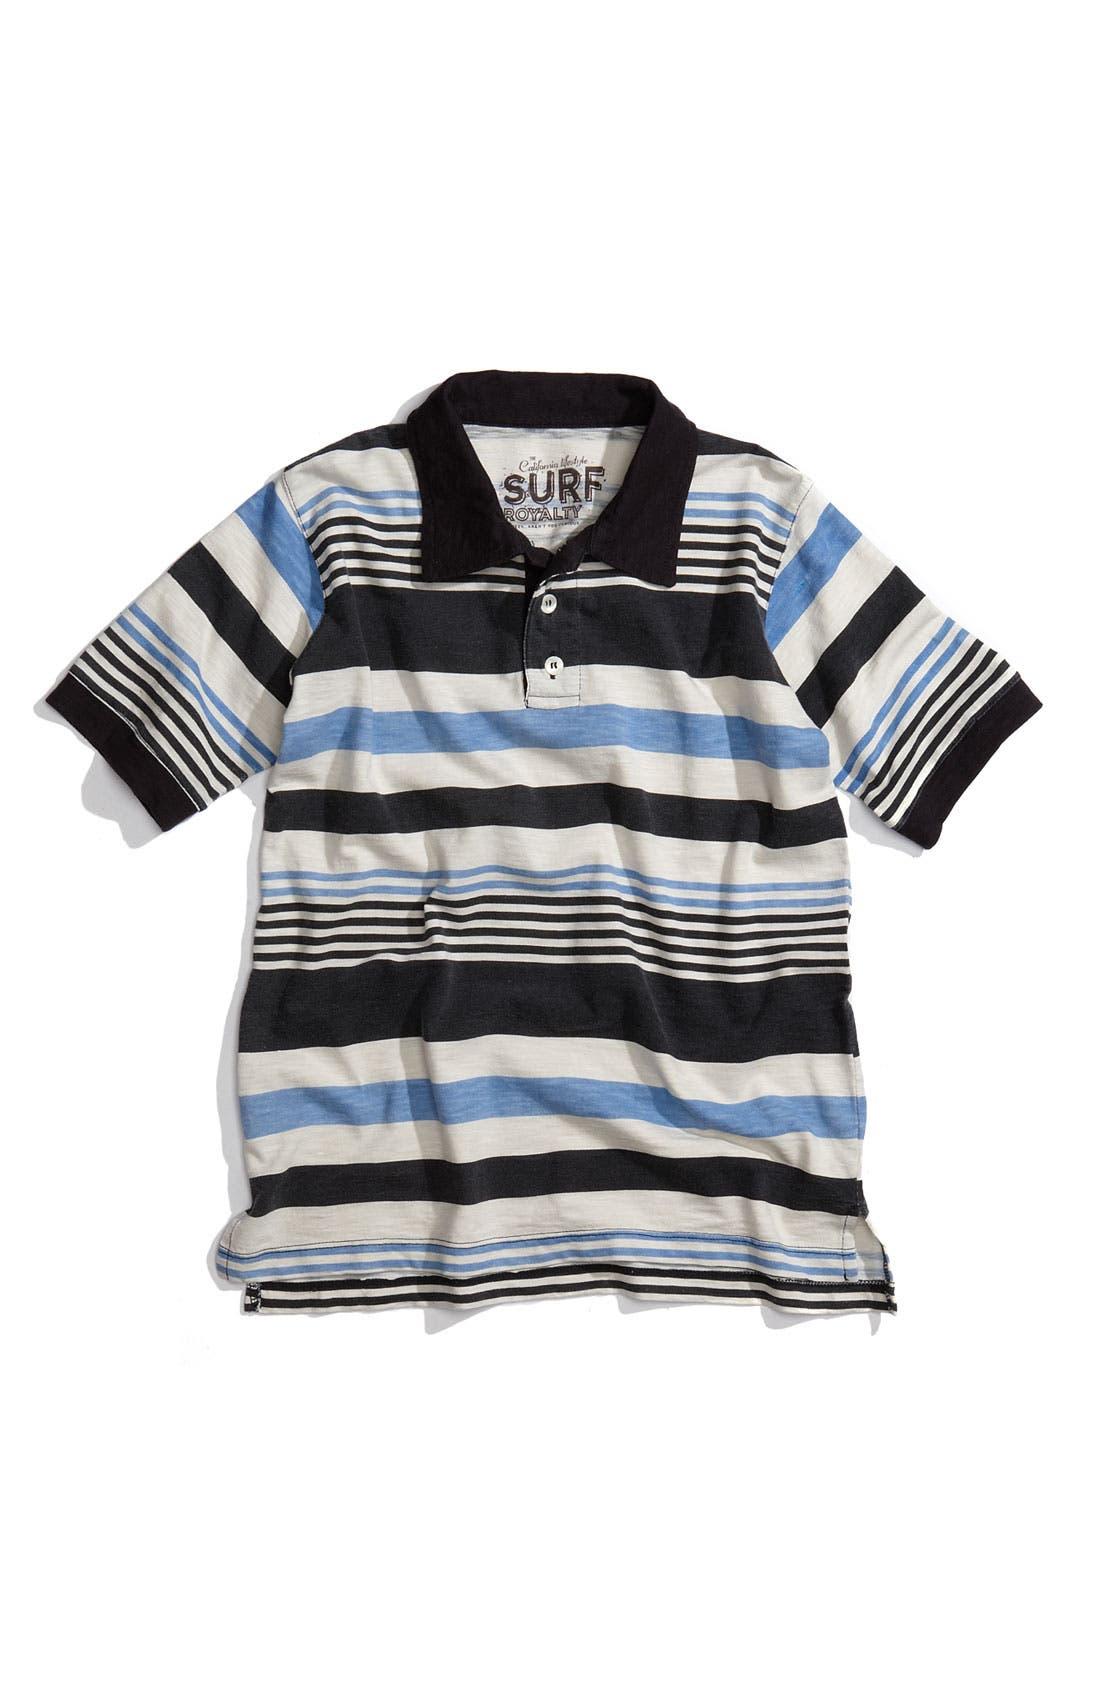 Main Image - Peek 'Malibu Stripe' Polo (Toddler)